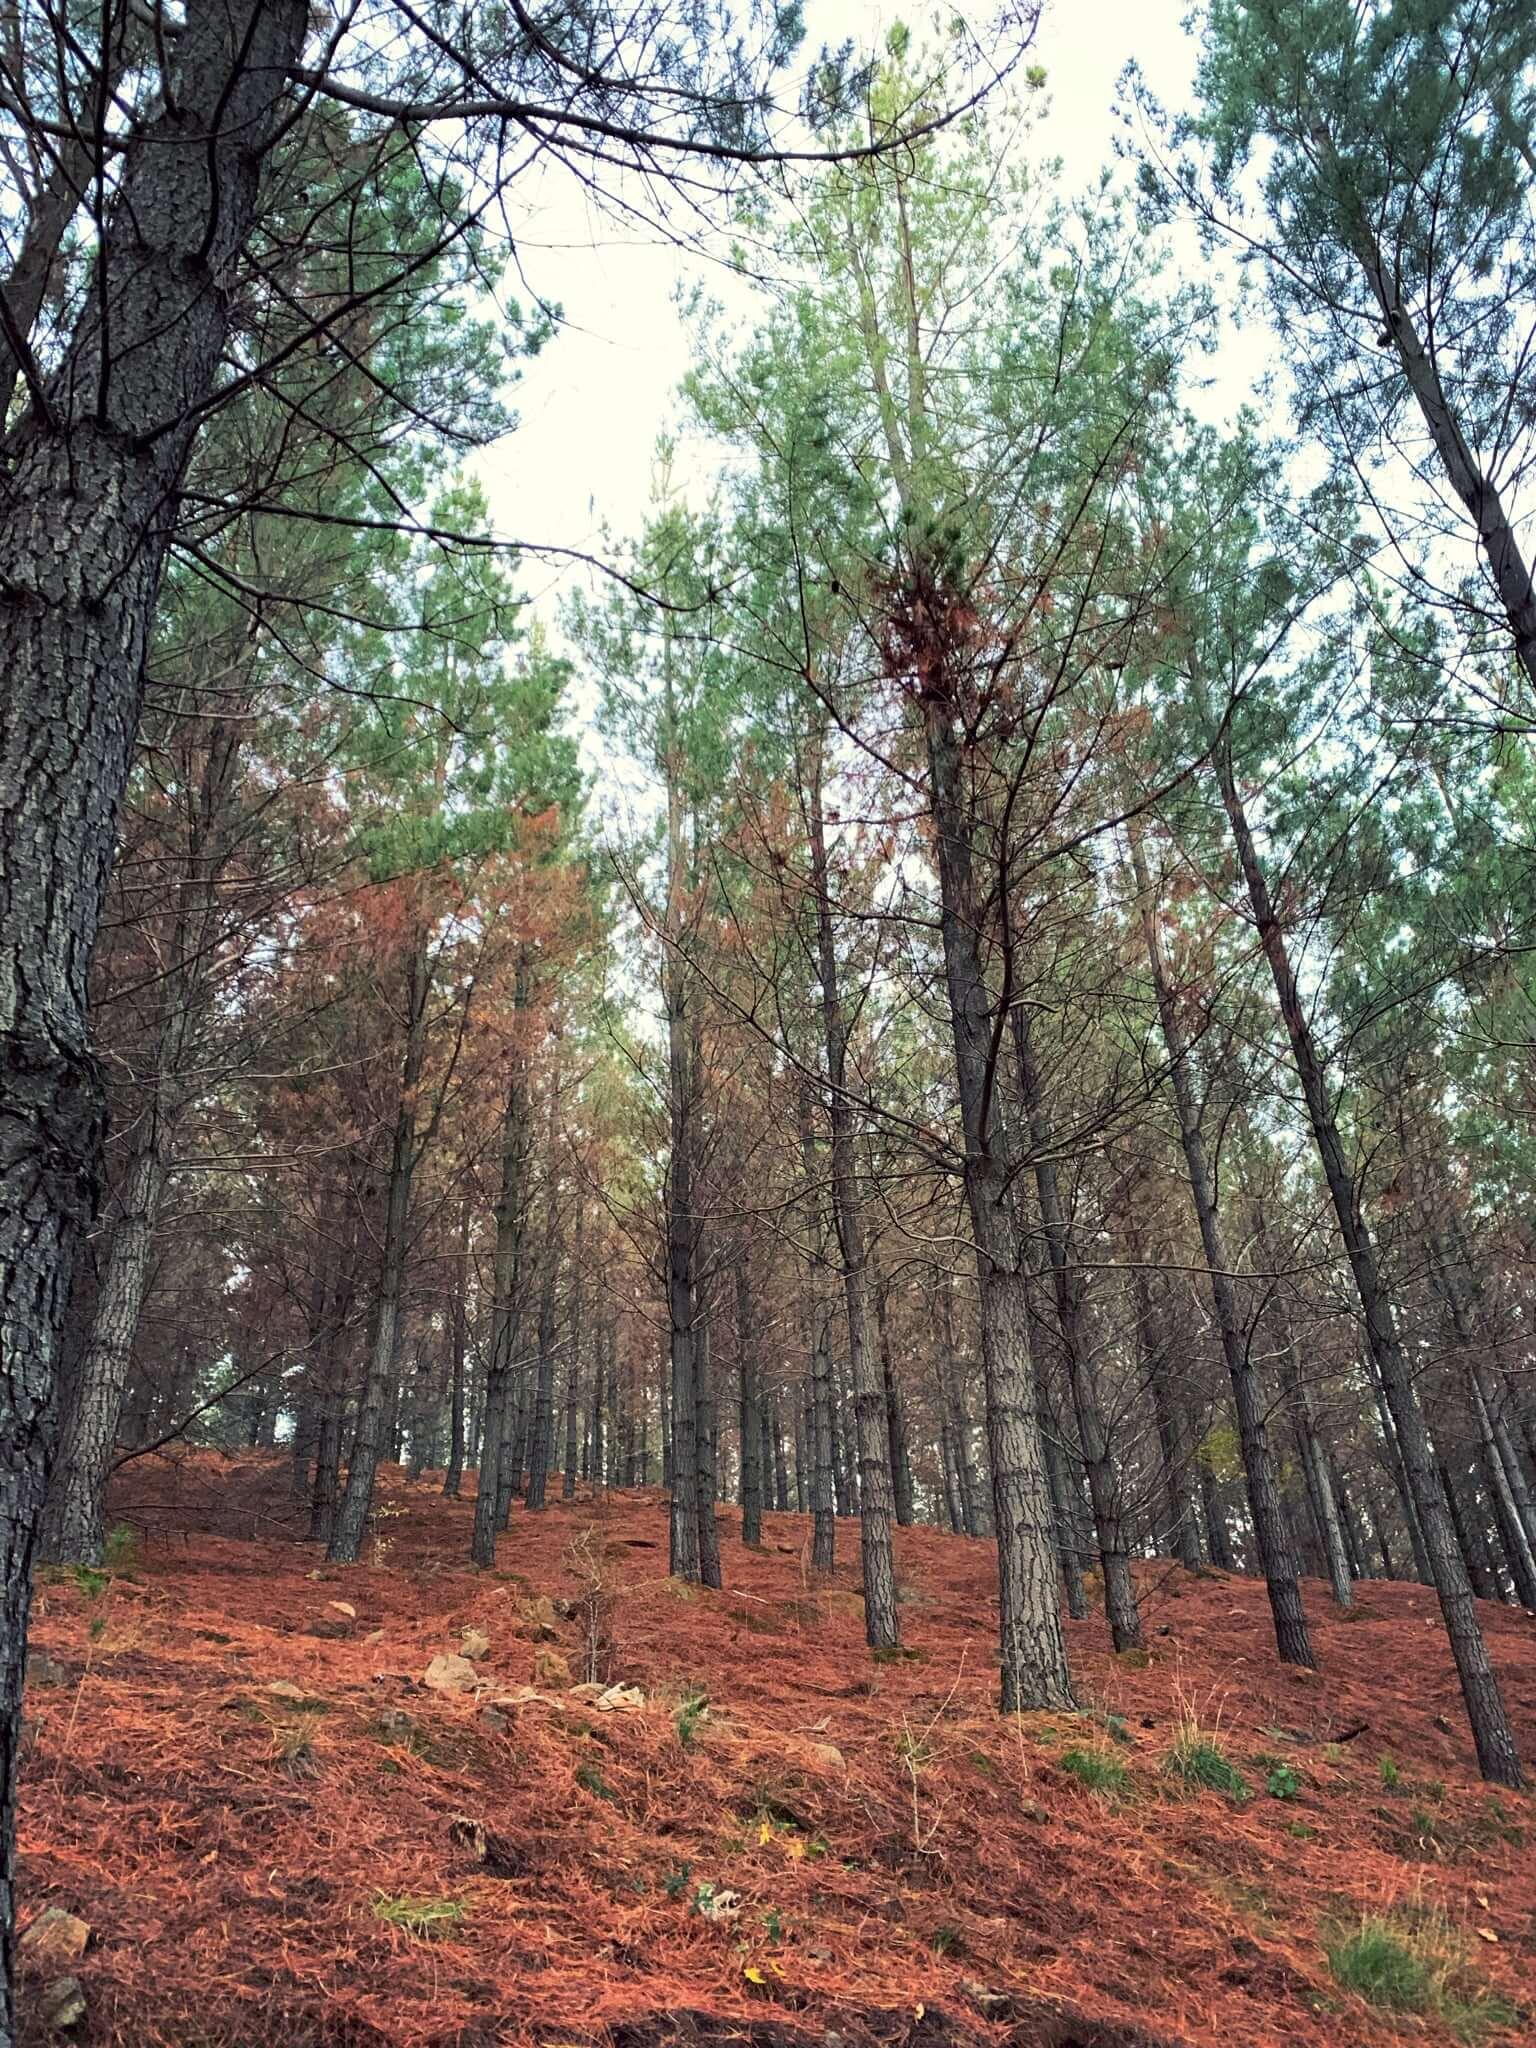 Pine forest, National Arboretum, Canberra